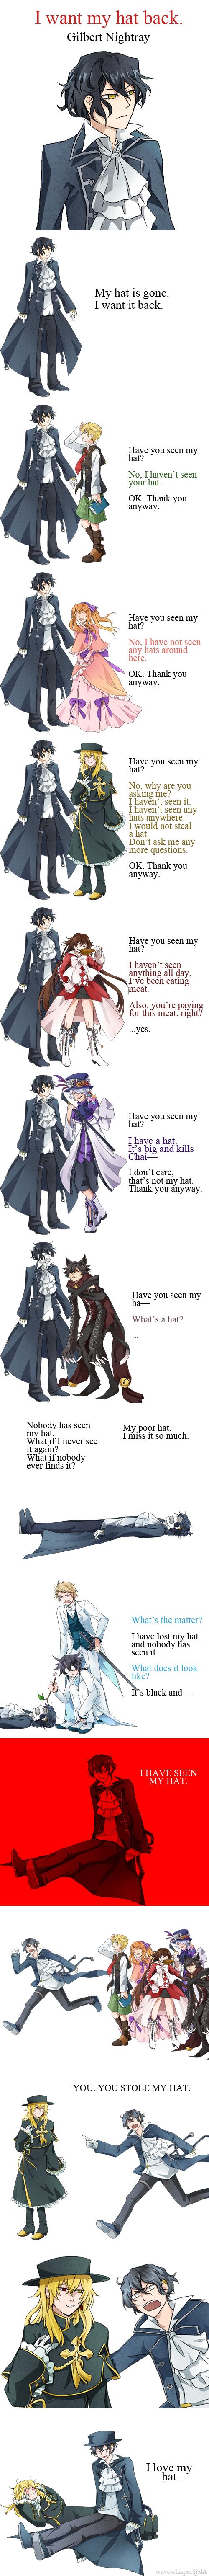 Tags: Anime, Wavewhisper, Pandora Hearts, Cheshire Cat (Pandora Hearts), Xerxes Break, Oz Vessalius, Leo Baskerville, Gilbert Nightray, Elliot Nightray, Alice Baskerville, Vincent Nightray, Sharon Rainsworth, Tailcoat